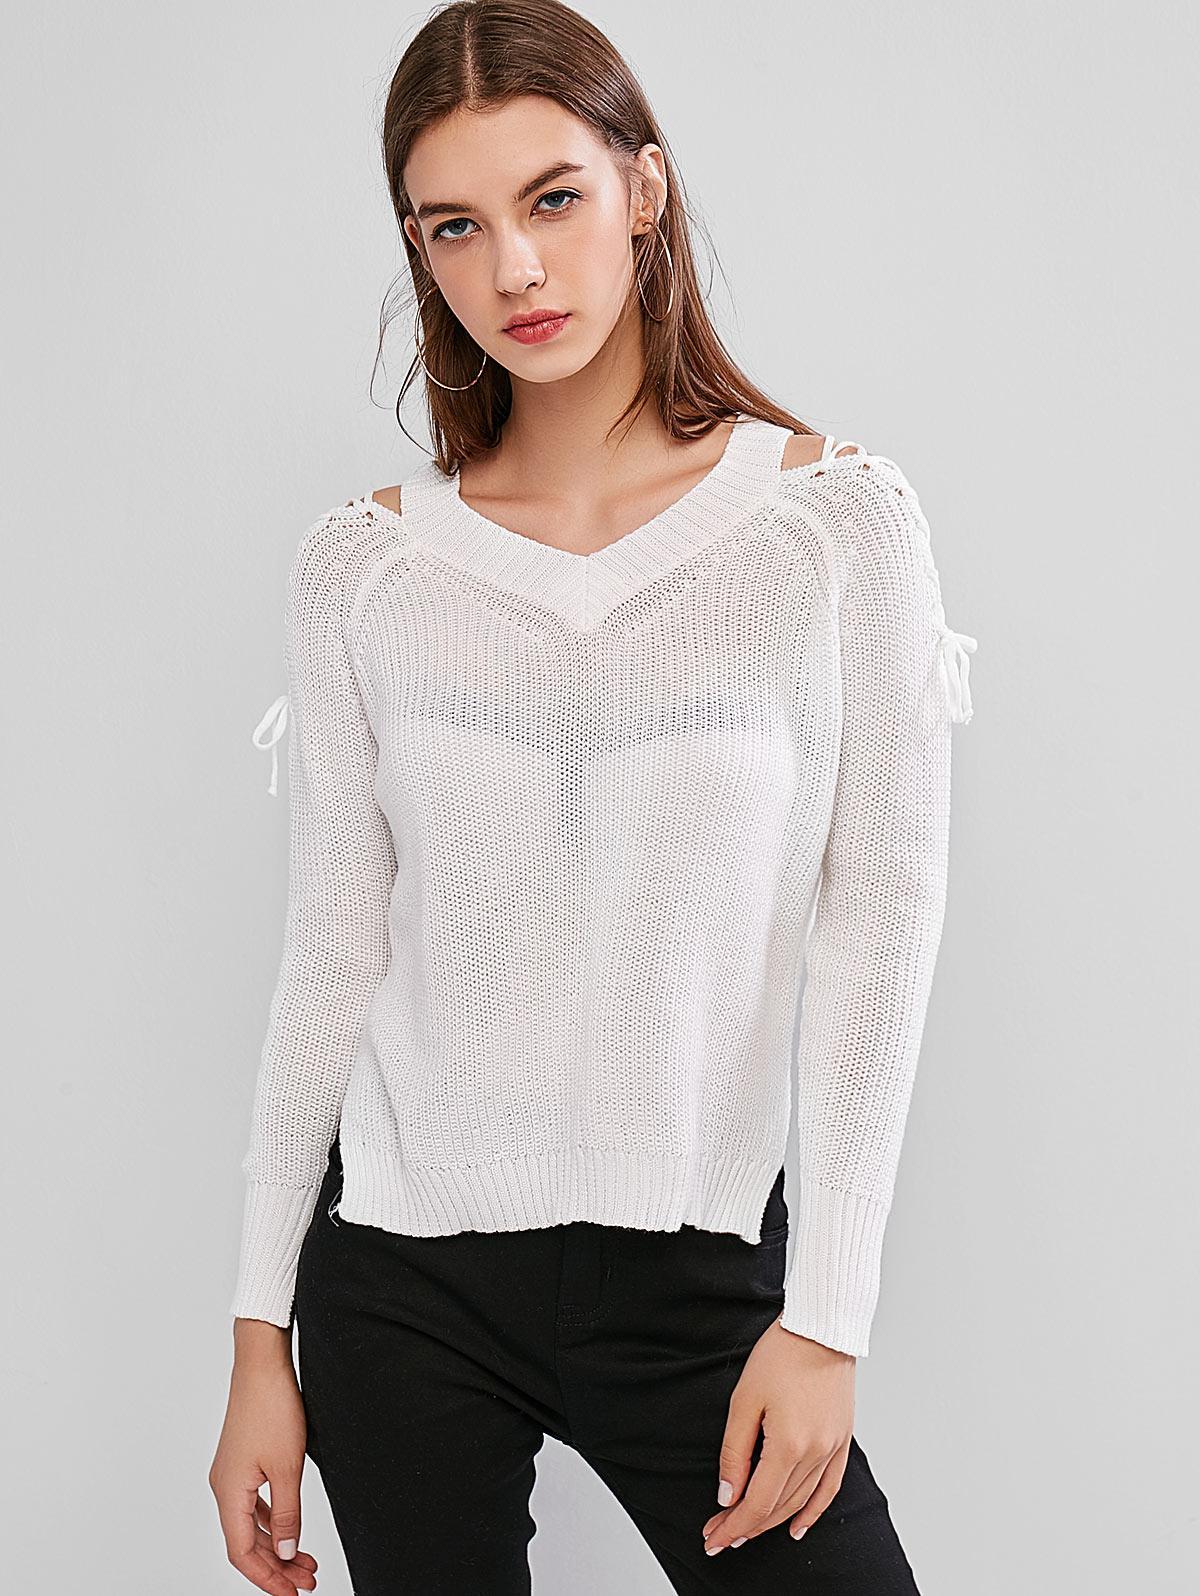 Lace Up Side Slit Raglan Sleeve Sweater